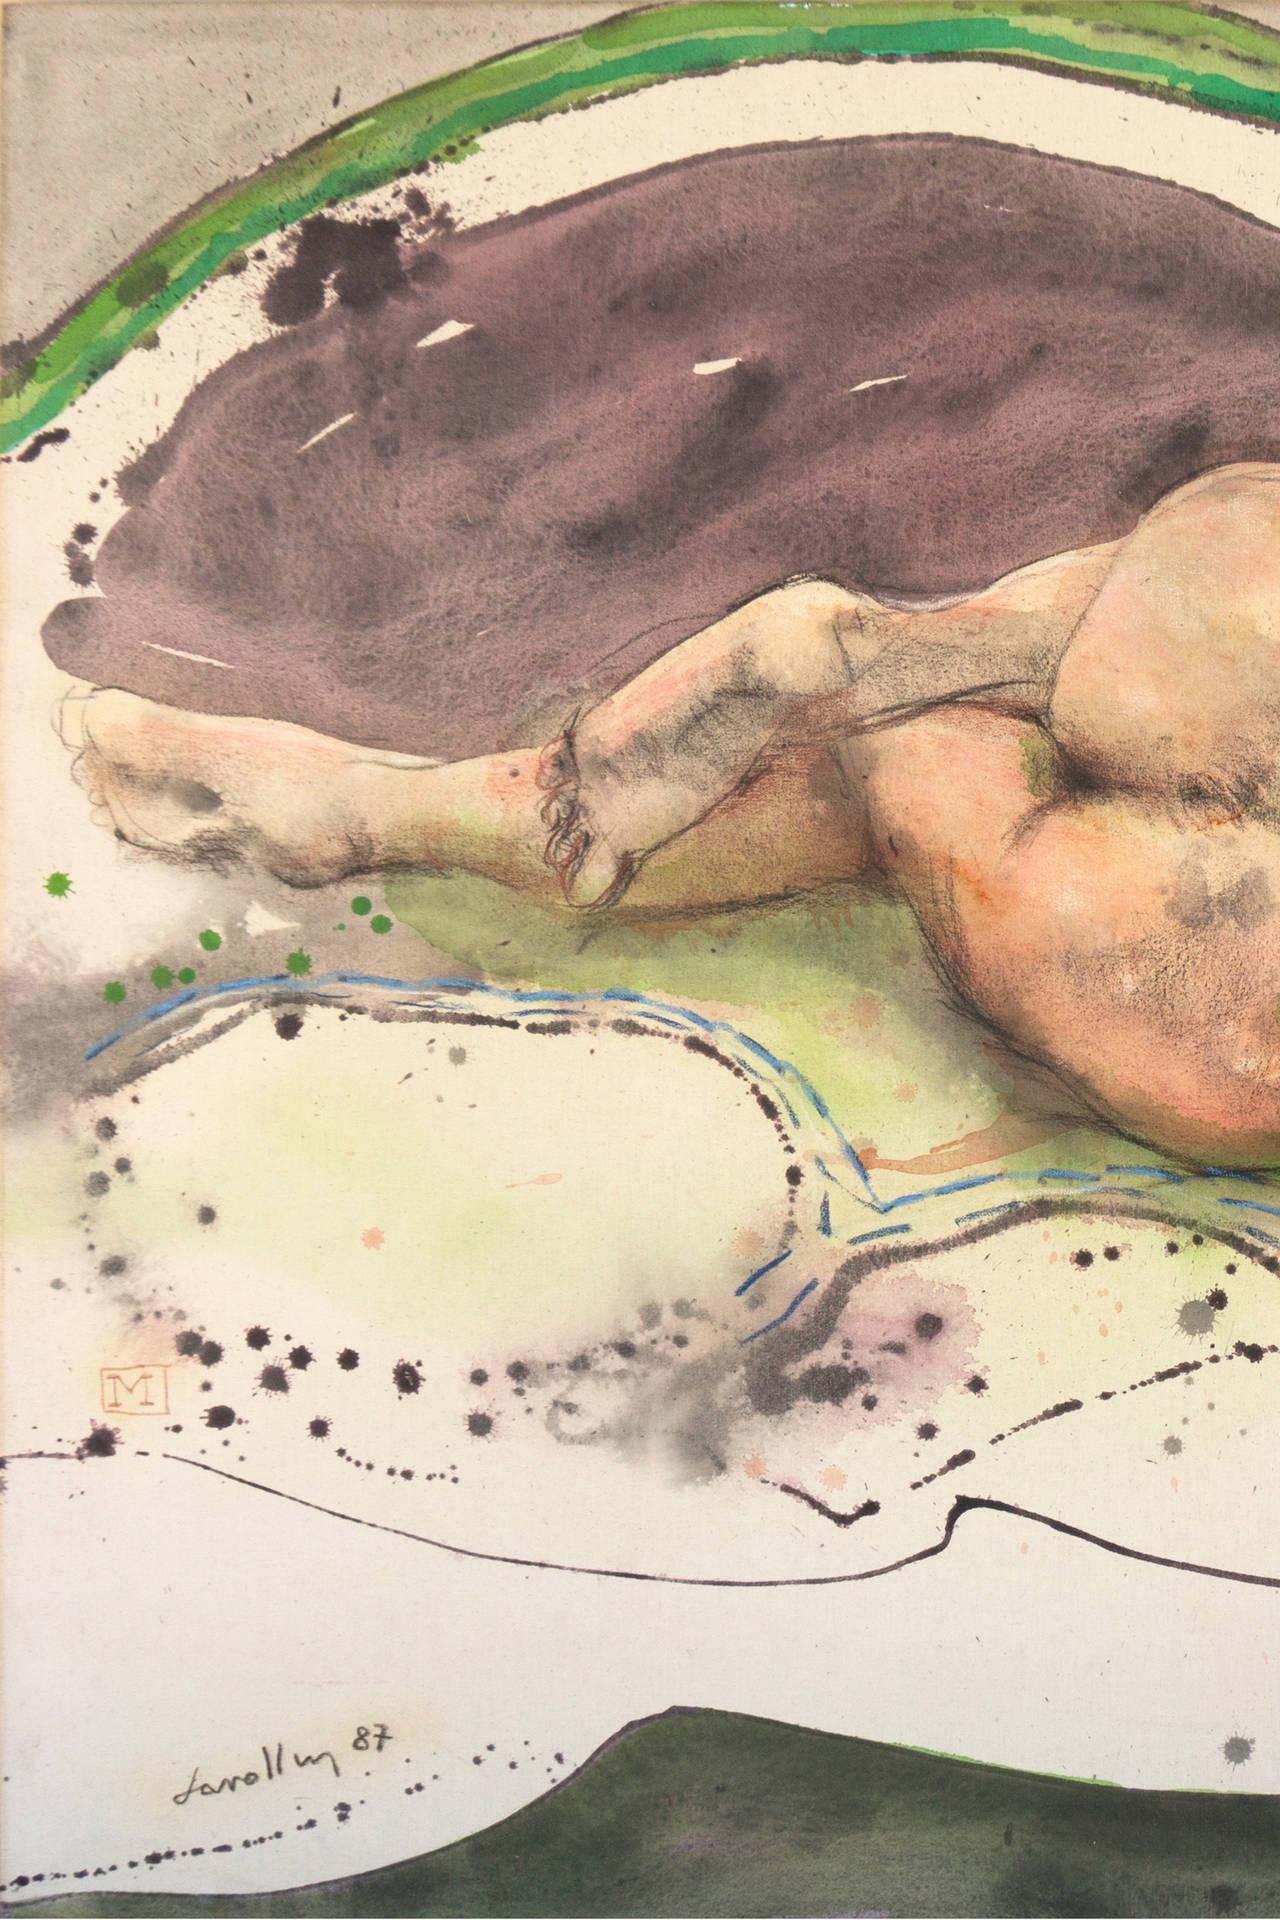 Mujer Dormida - Painting by Julio Lavallen